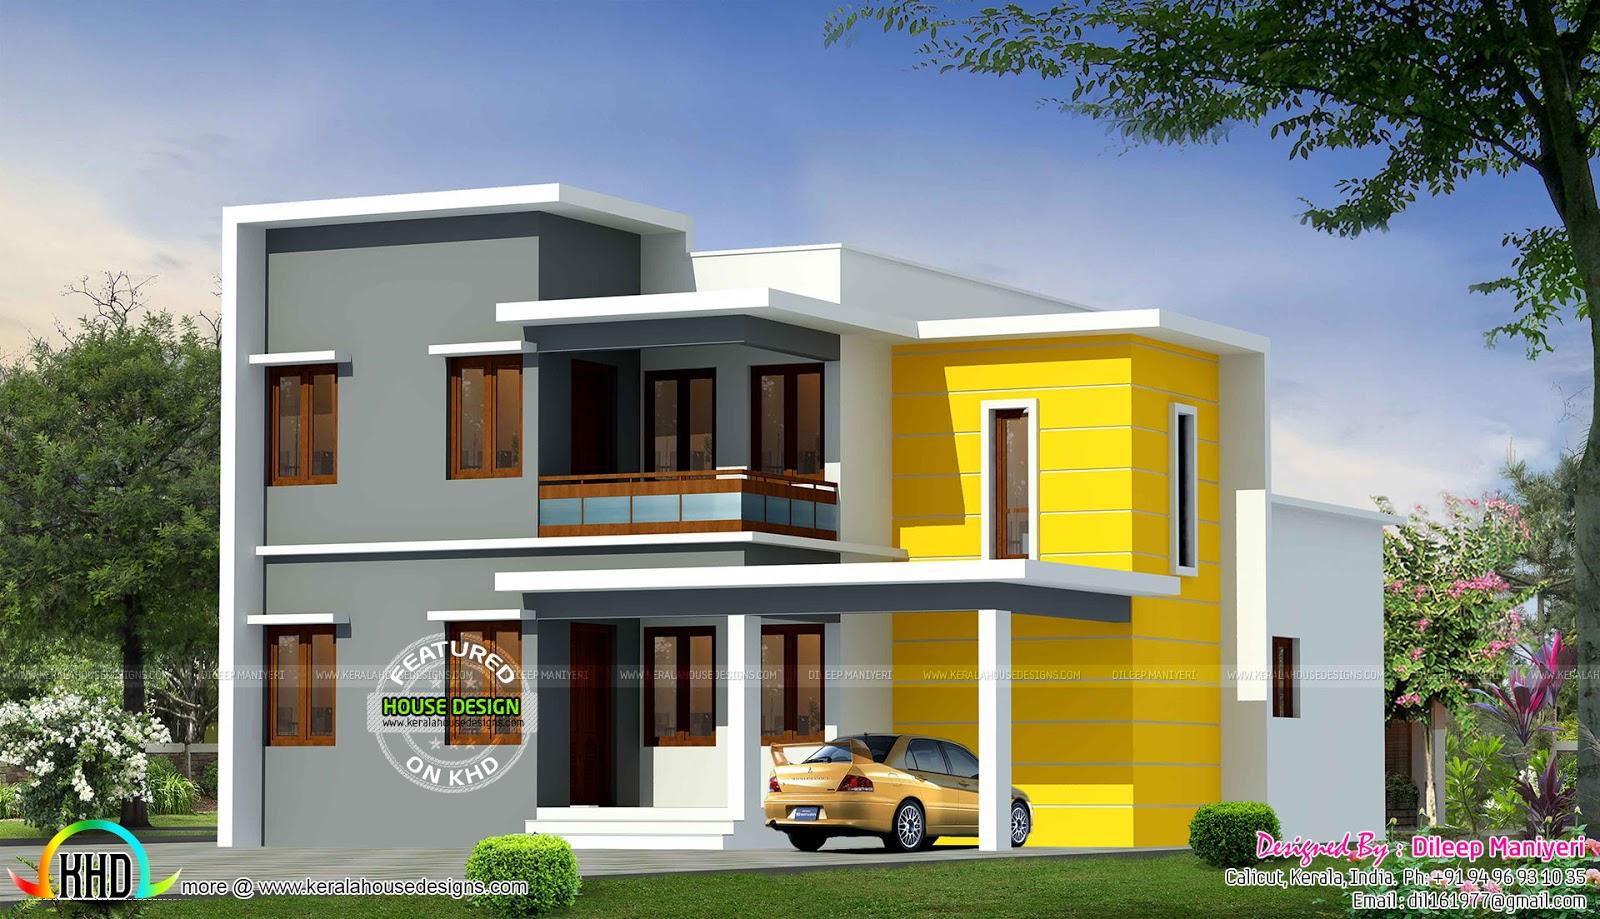 1975 Sq Ft Box Model Flat Roof Home Kerala Home Design